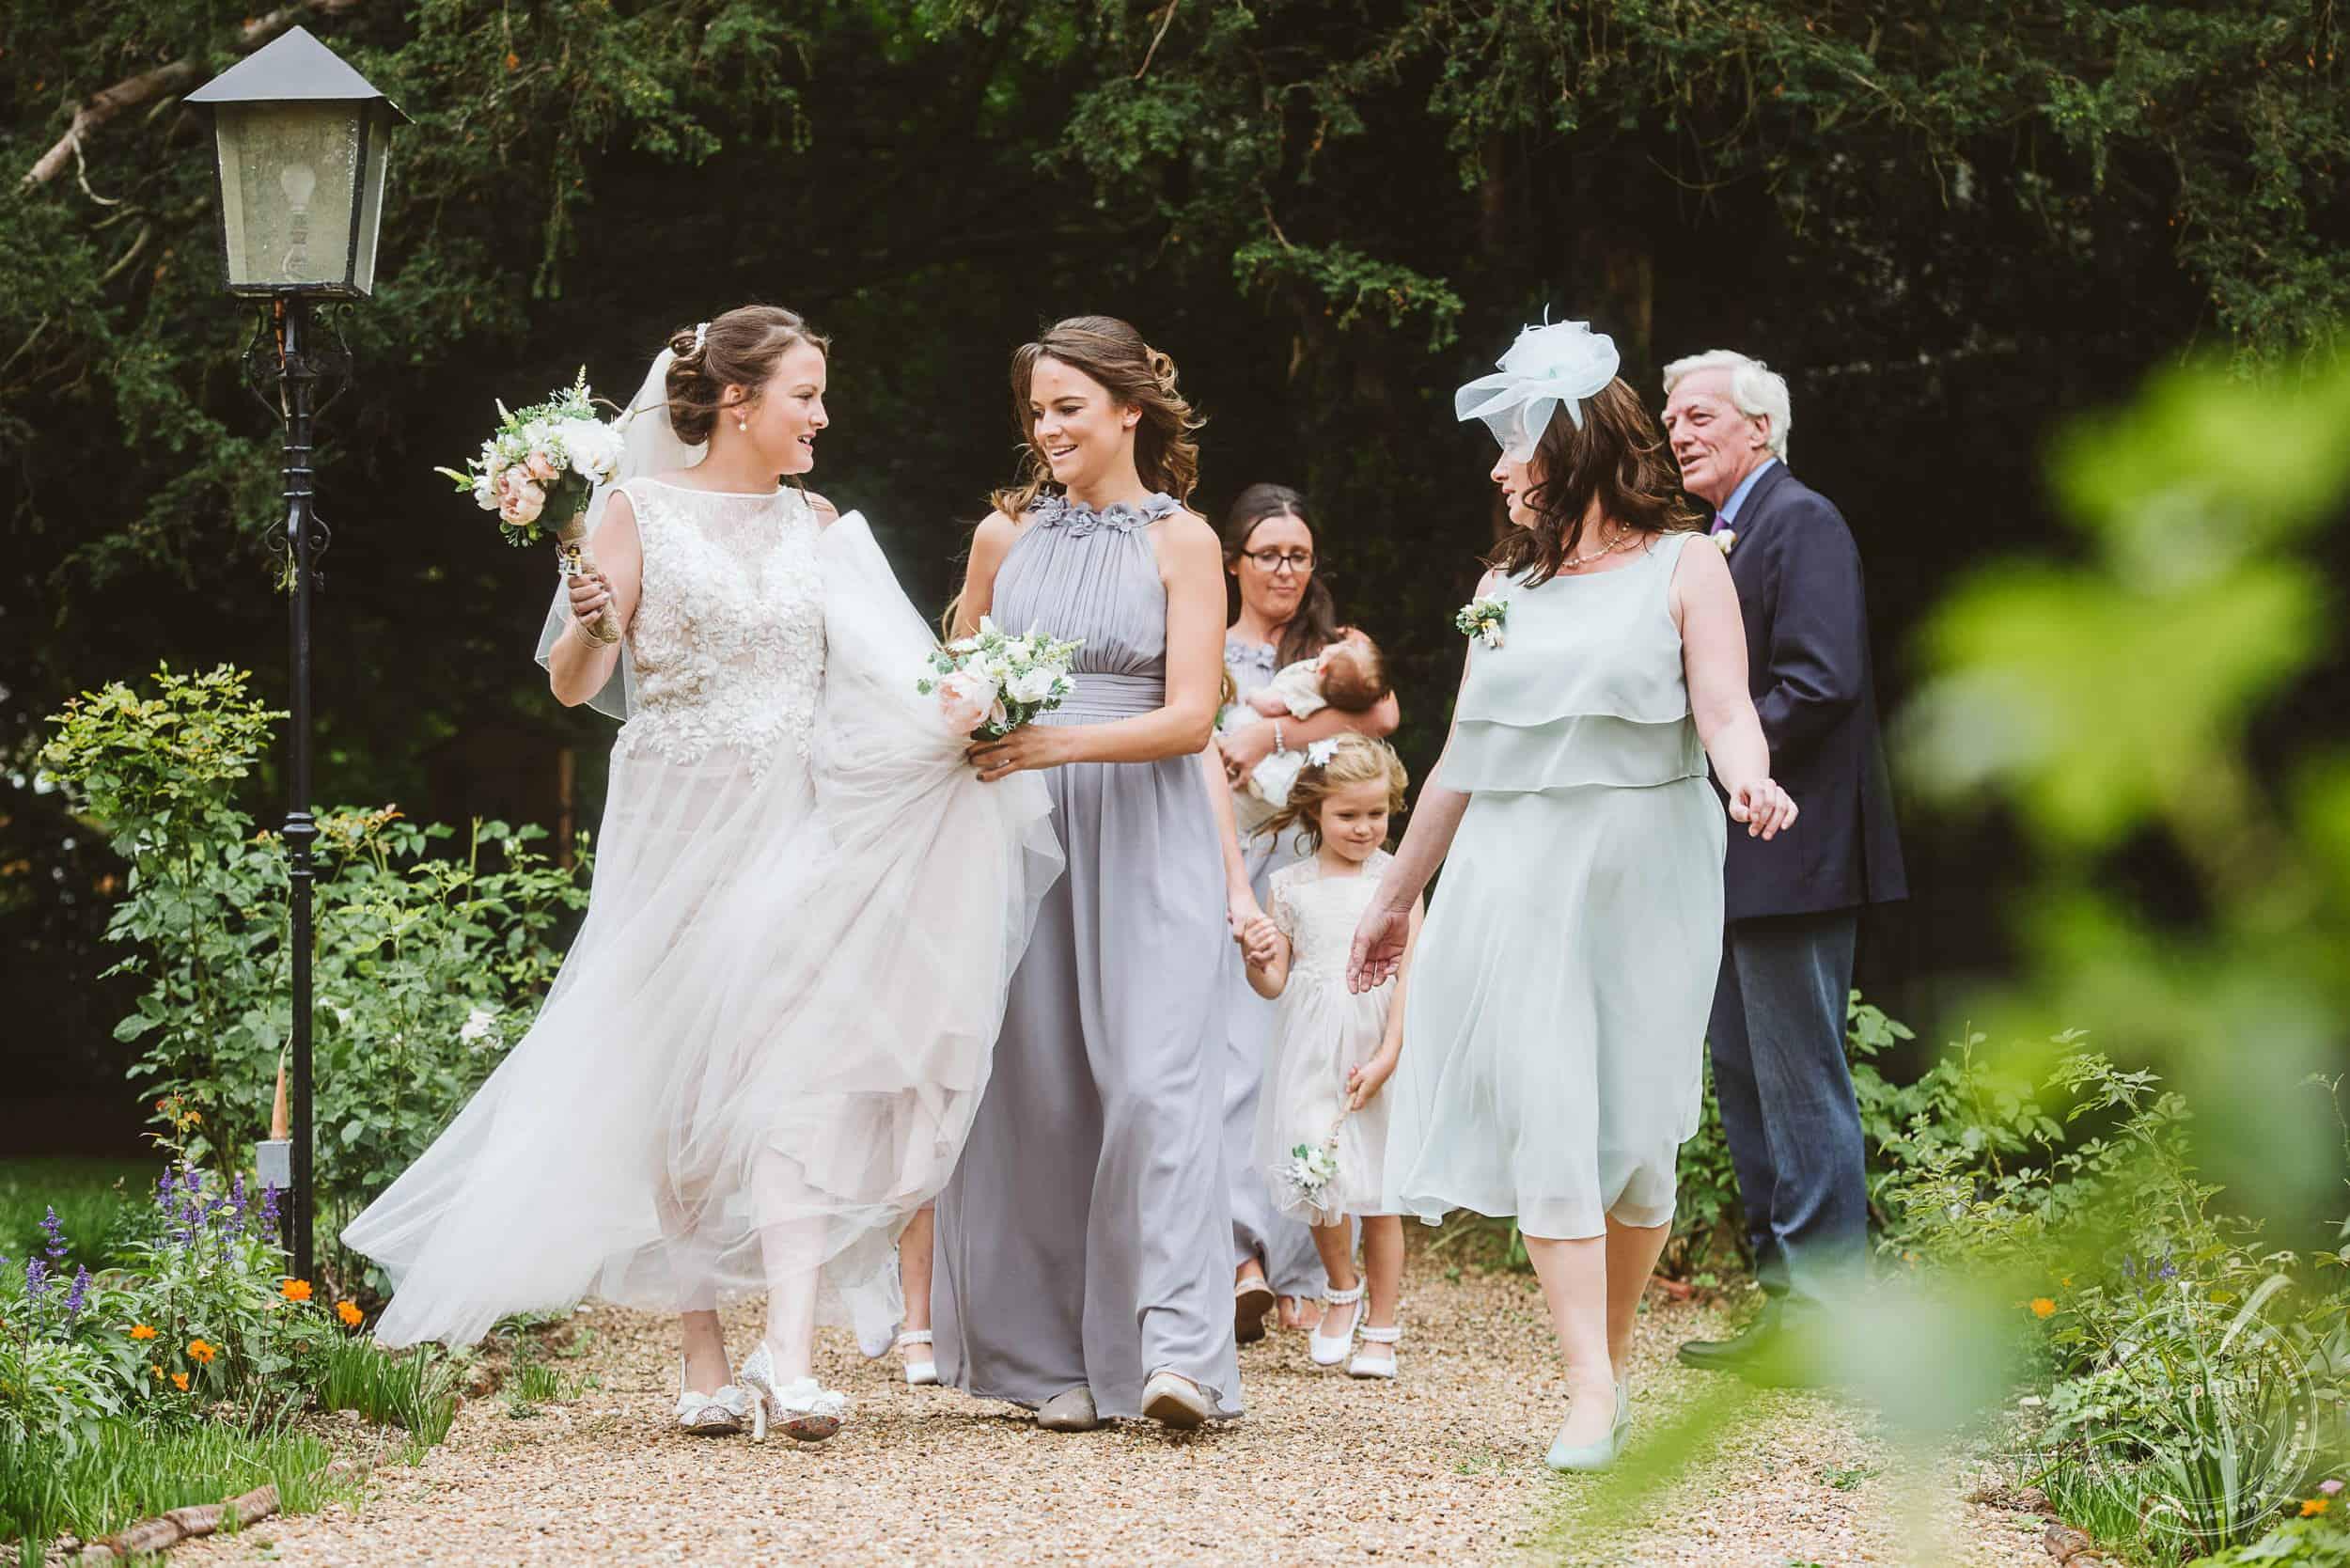 180818 Marks Hall Wedding Photography Lavenham Photographic 041